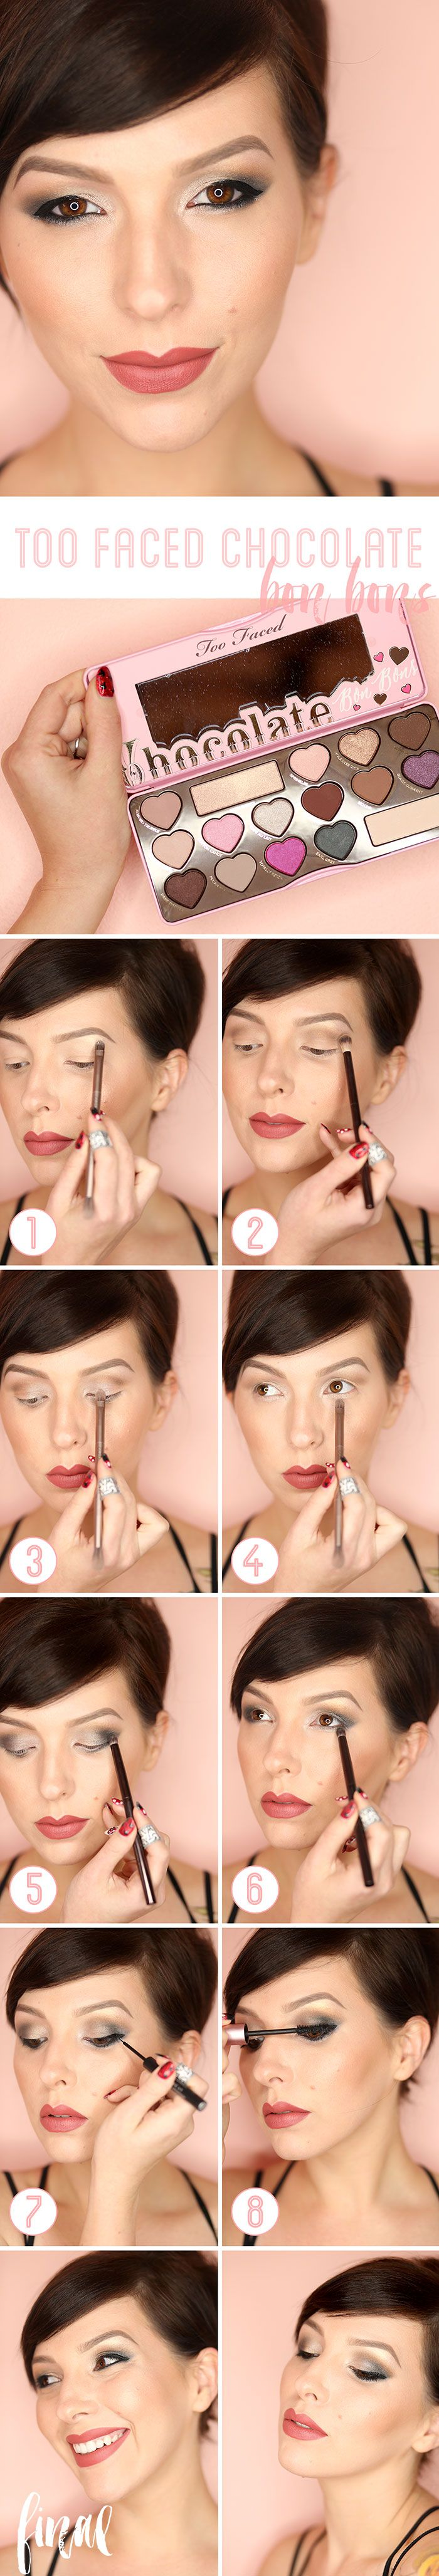 Too Faced Chocolate Bon Bons Eyeshadow Palette Tutorial - Keiko Lynn